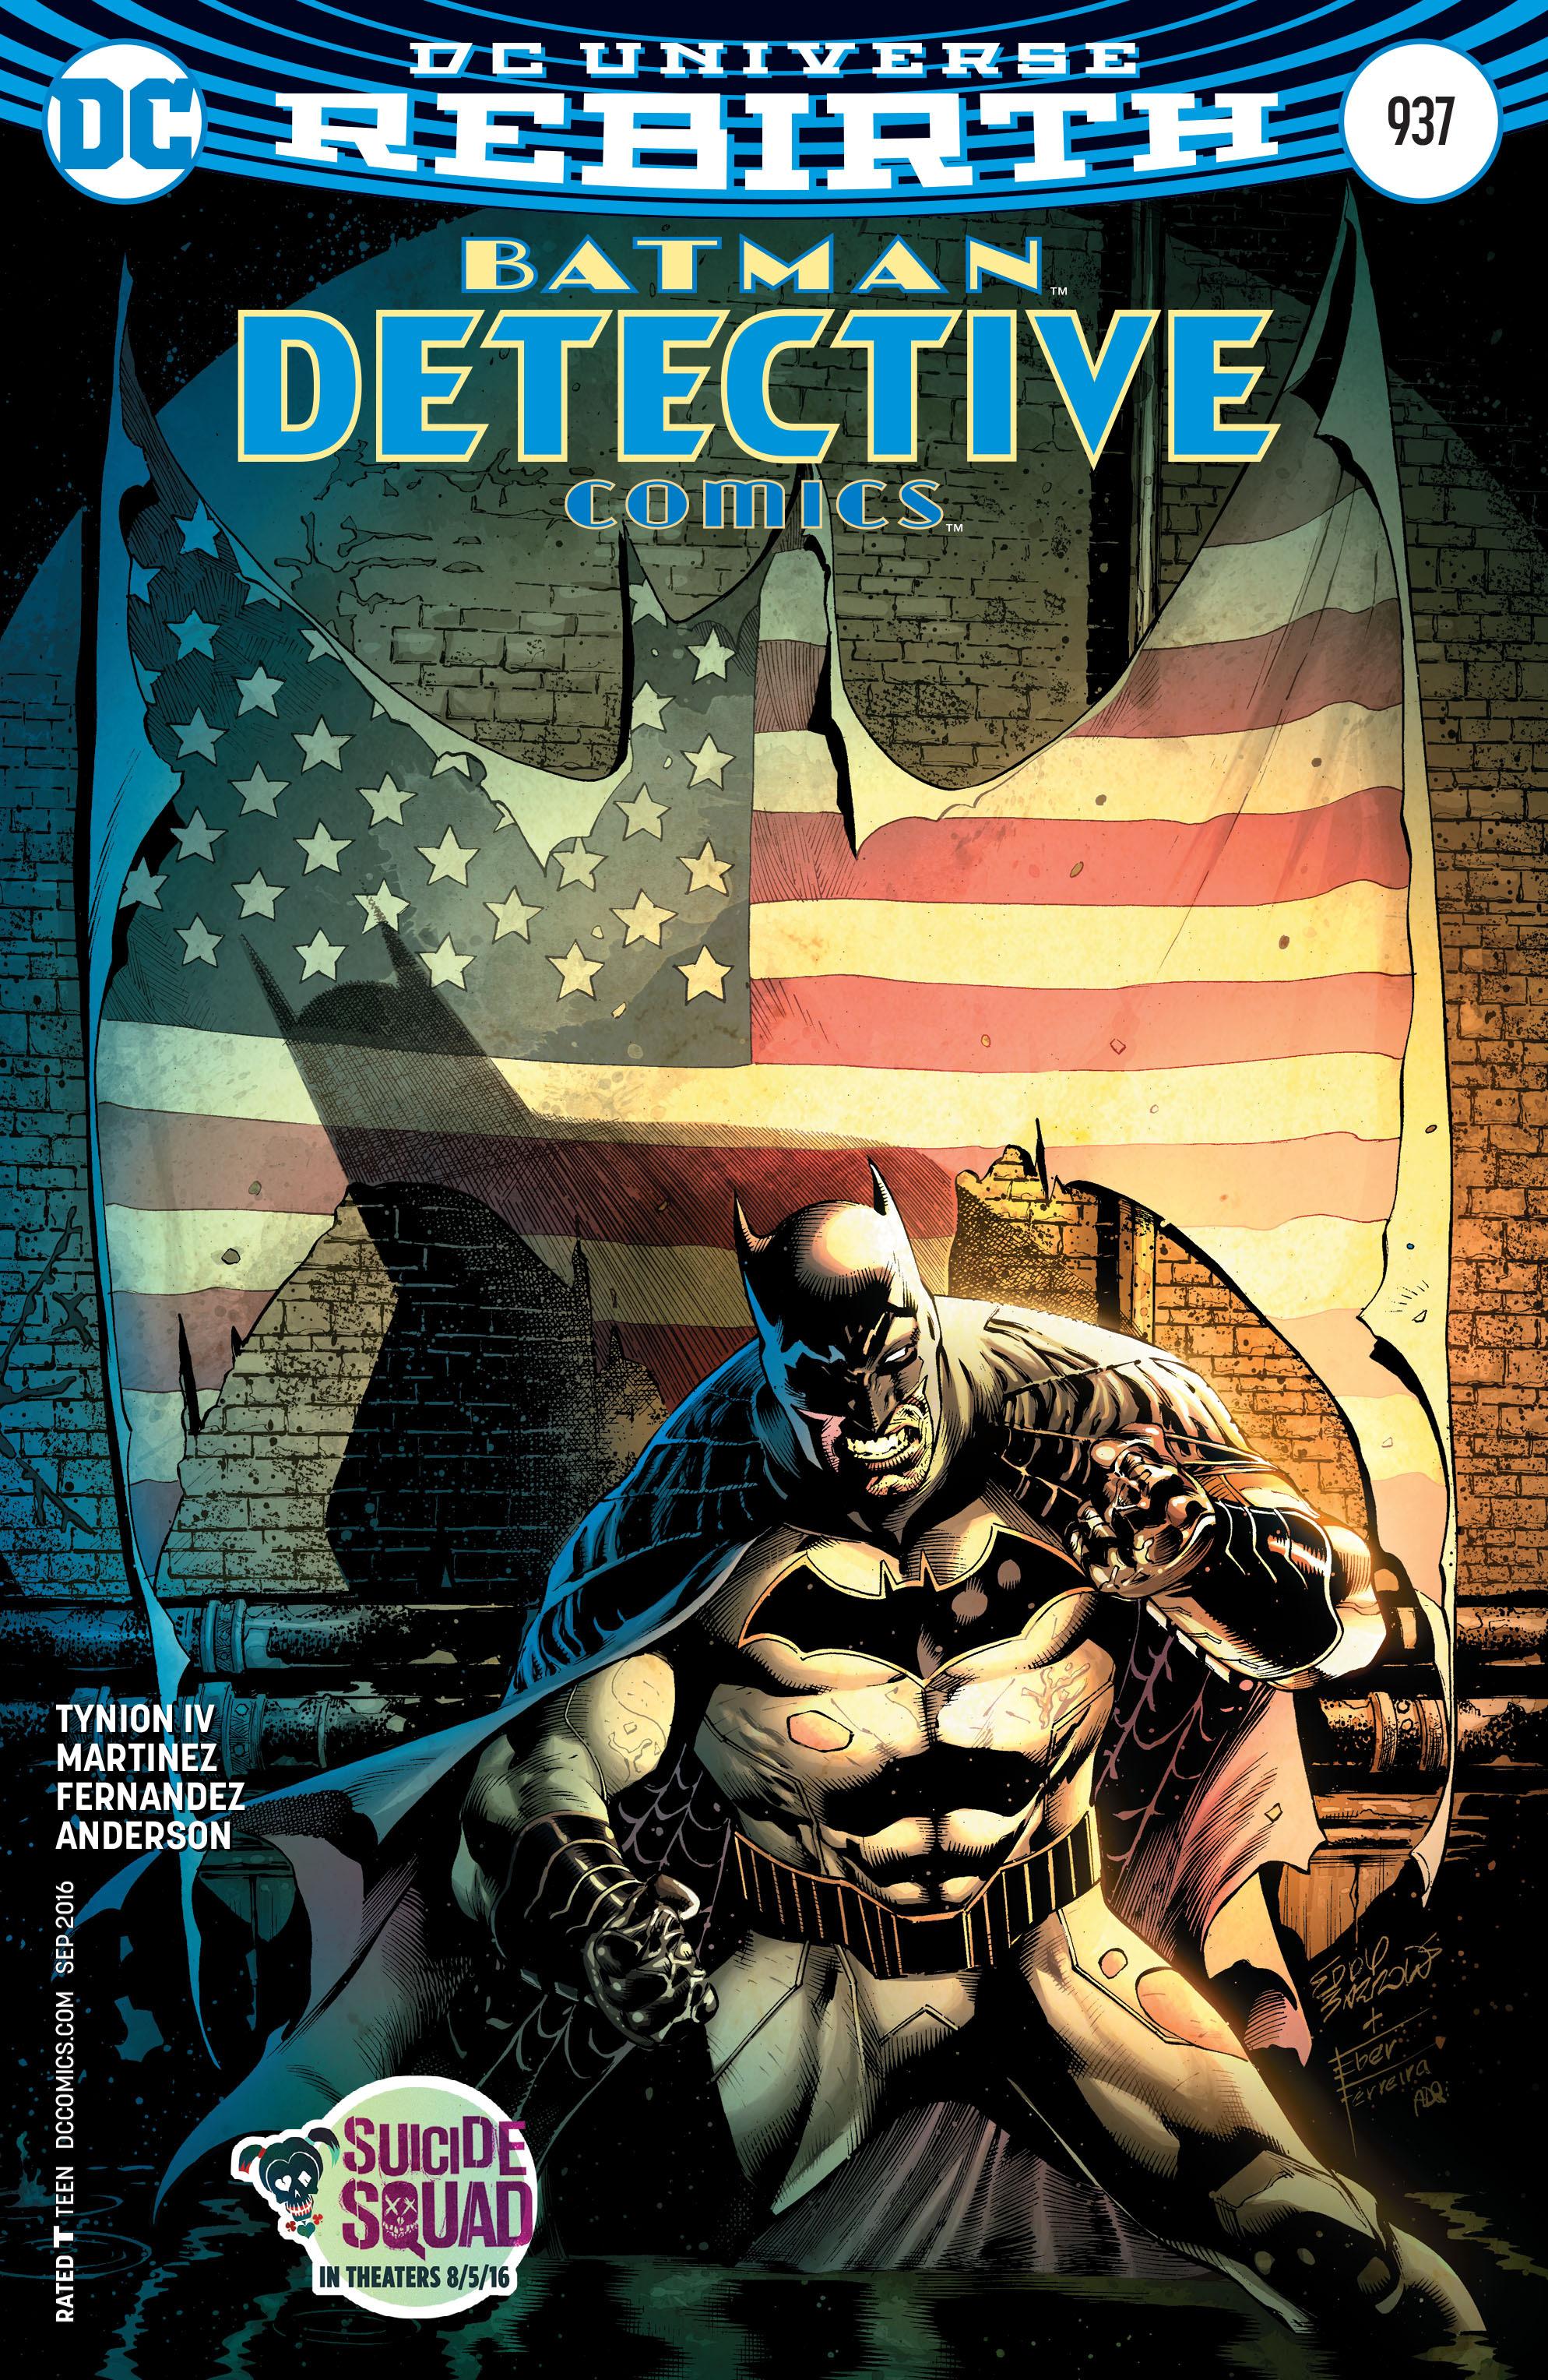 Detective Comics (2016) 937 Page 1